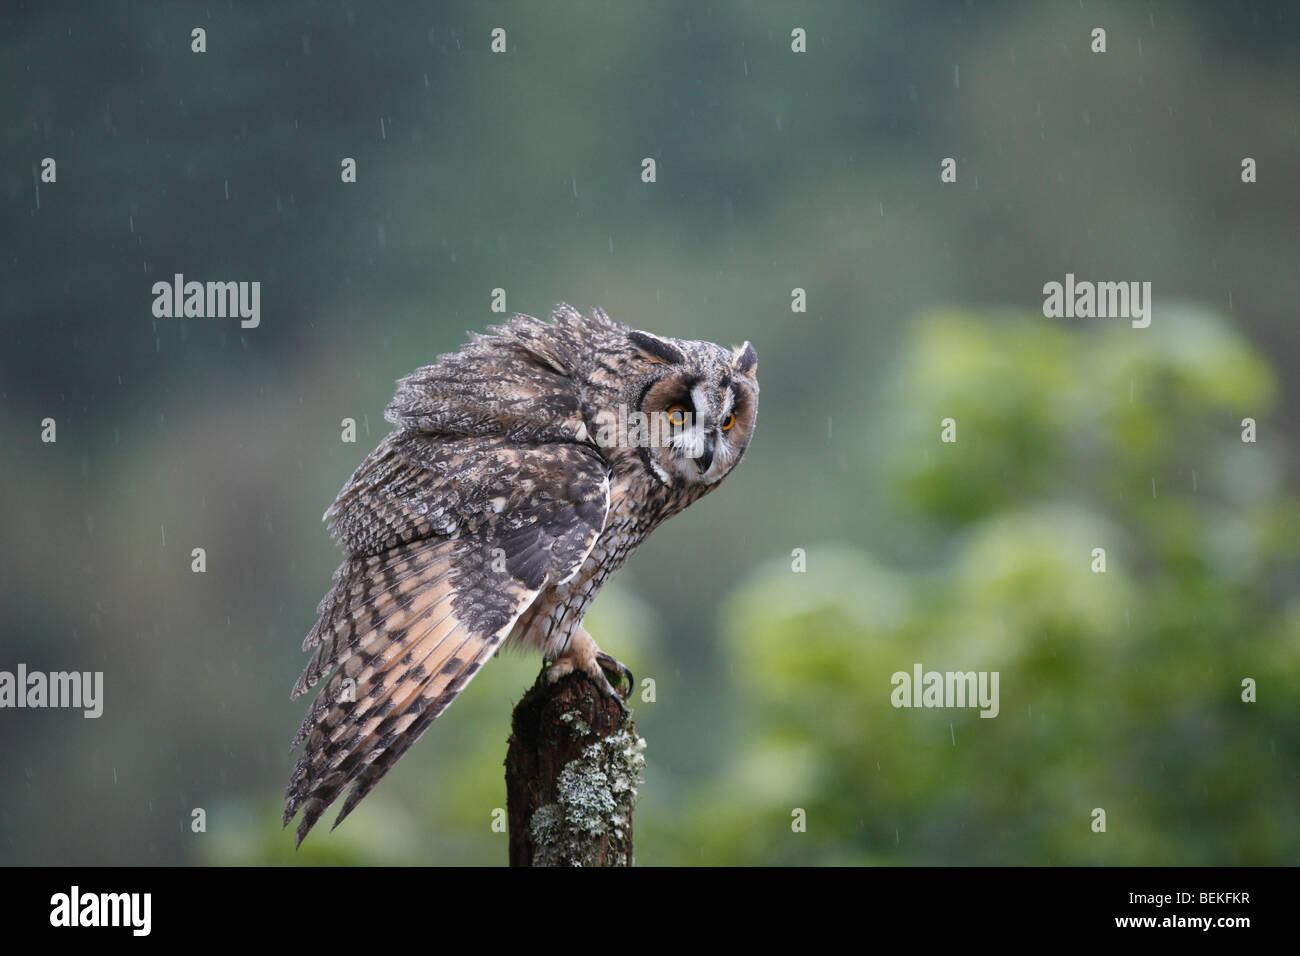 Long eared owl (Asio otus) perching on fence post in rain - Stock Image